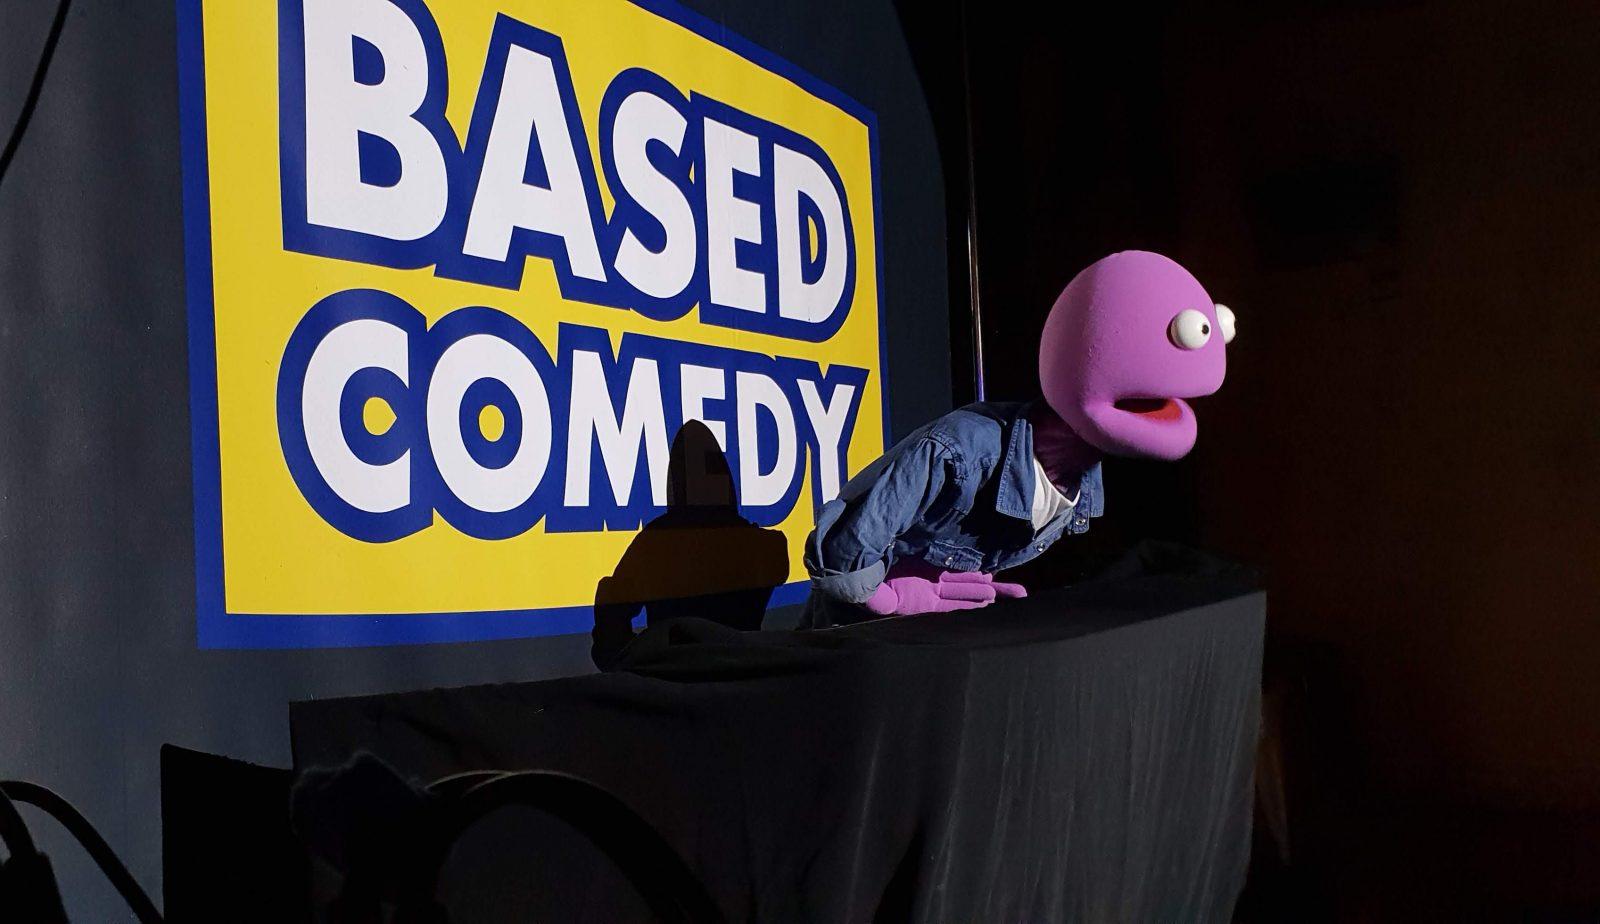 Based Comedy at Miami Tavern